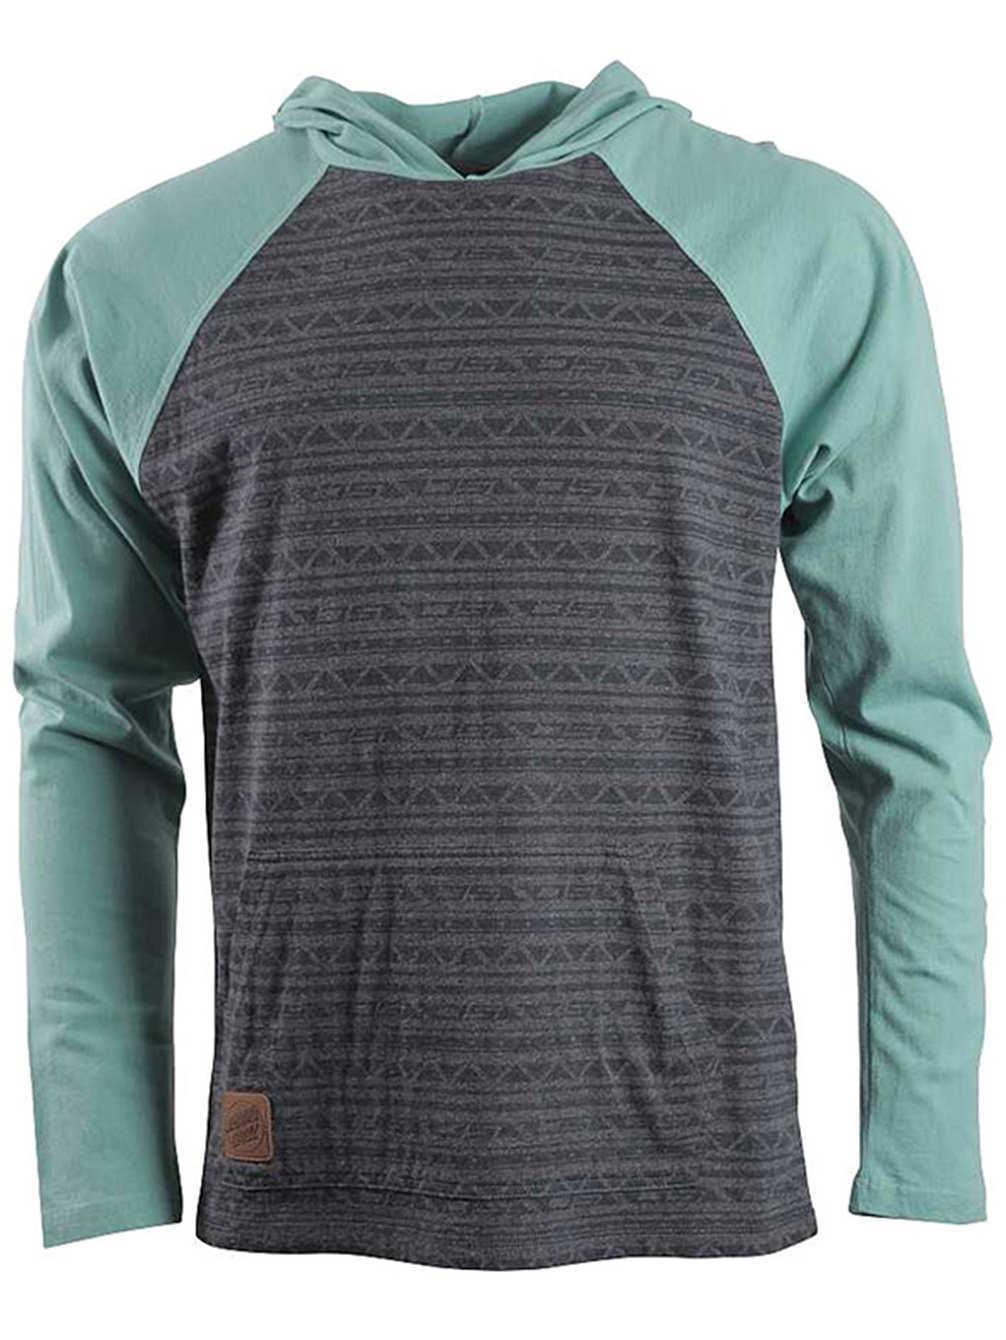 SANTA CRUZ Kapuzen Longsleeve Shirt Bombora, grau grau grau   türkis, Gr. XL  | Optimaler Preis  62e8d6